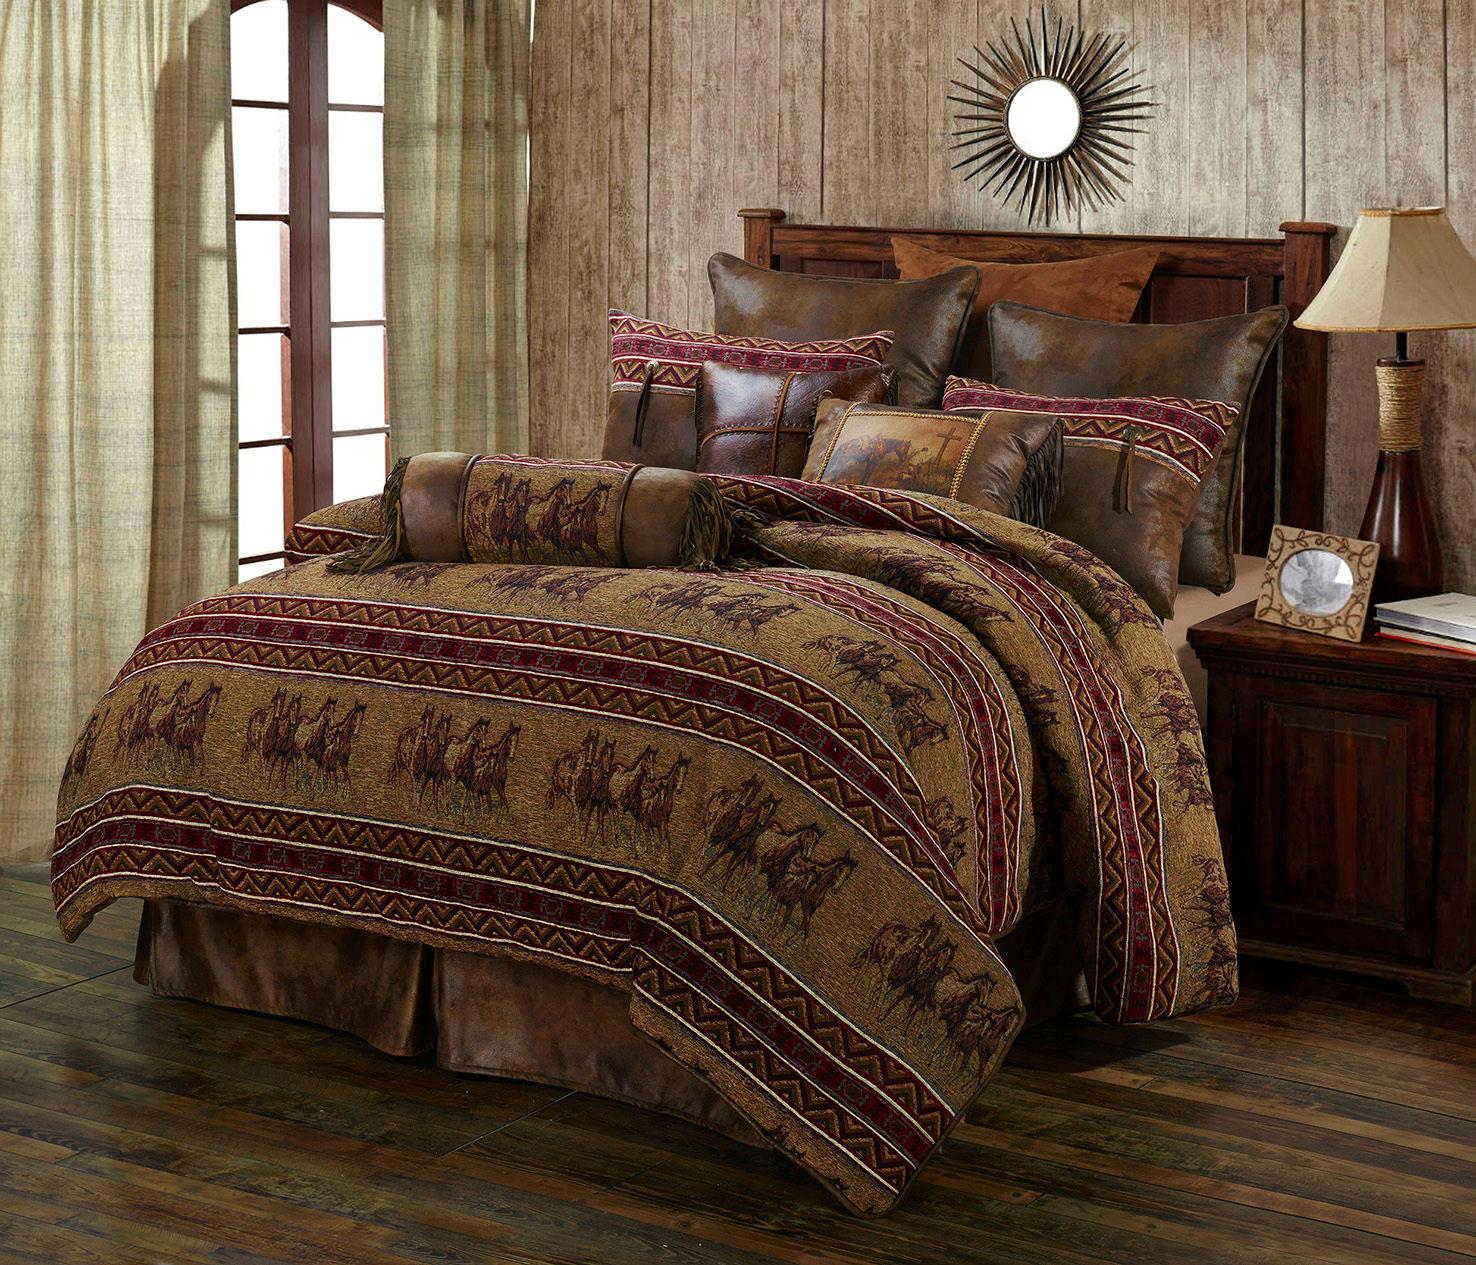 Western Horse 5 Piece Super Größe Comforter Bedding Set - FREE SHIPPING